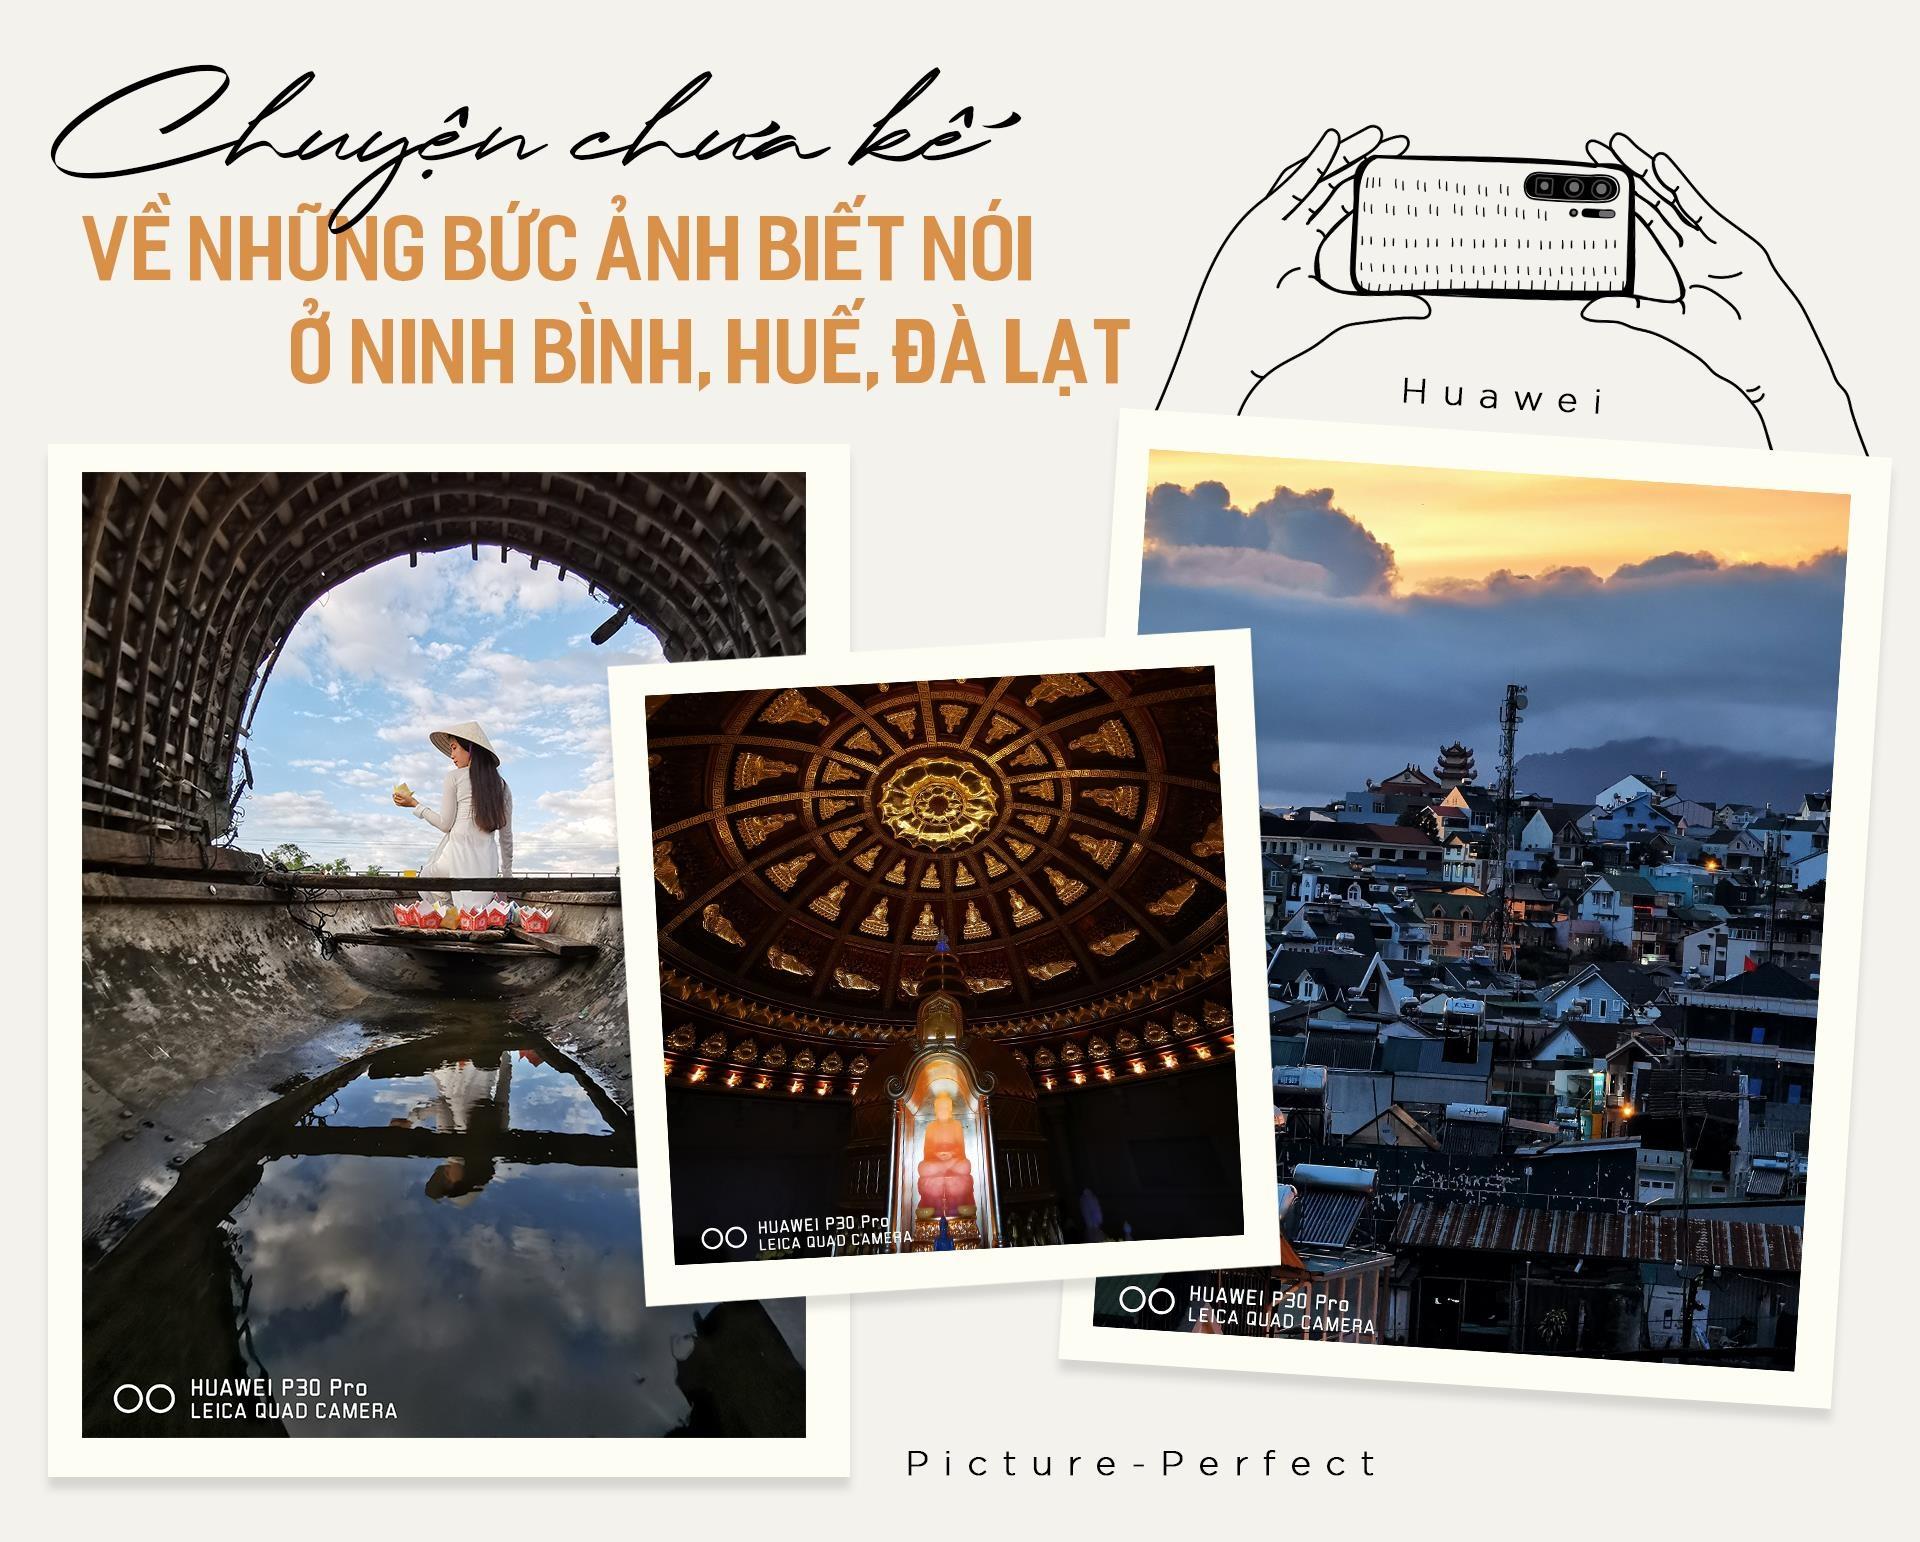 Chuyen chua ke ve nhung buc anh biet noi o Ninh Binh, Hue, Da Lat hinh anh 2